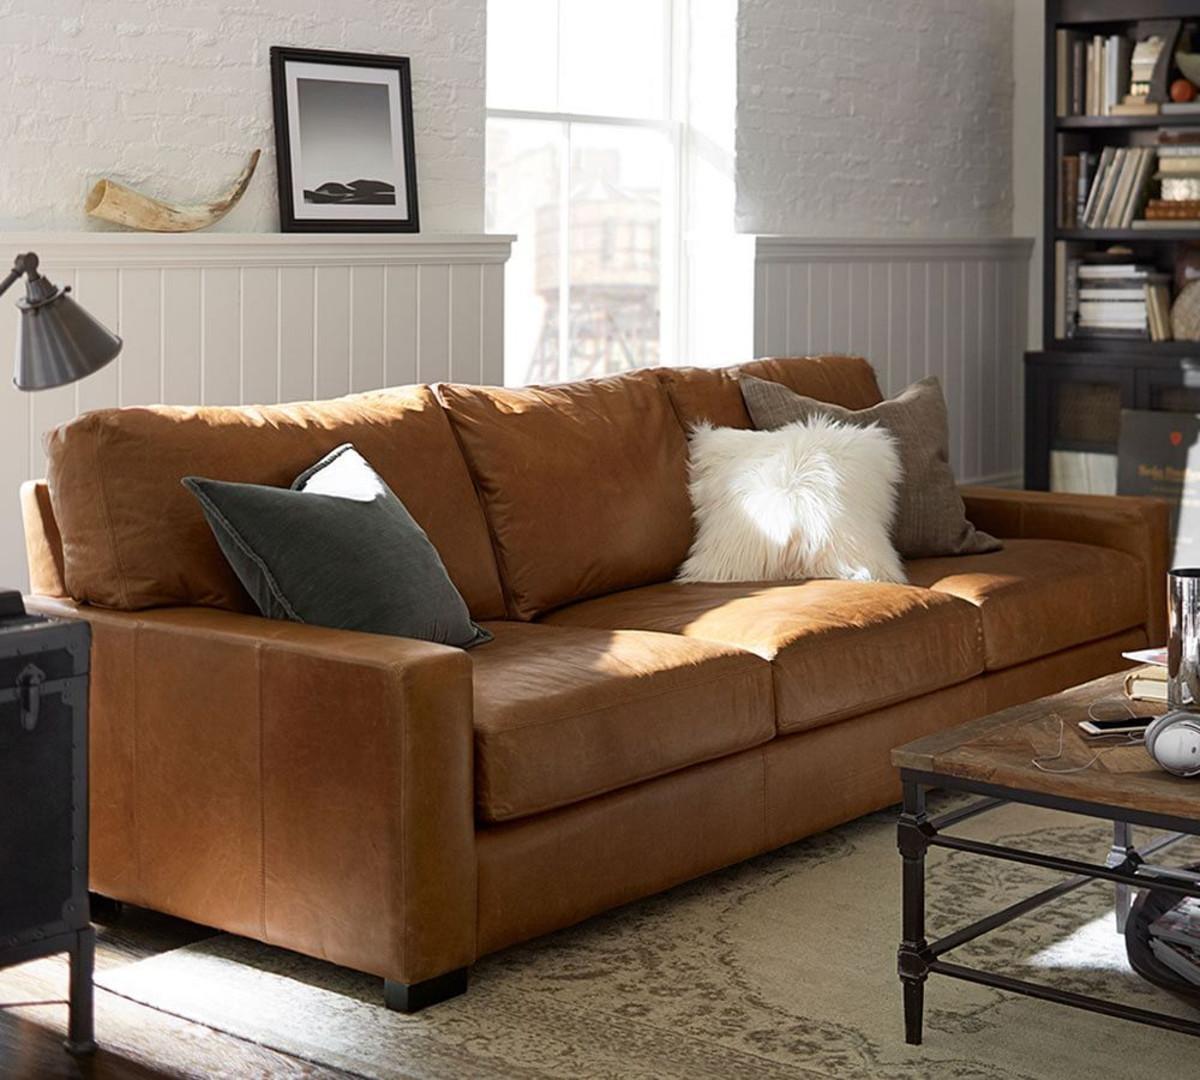 Caramel Leather Sofa Set | Demand Sofas Set With Regard To Caramel Leather Sofas (Image 5 of 20)